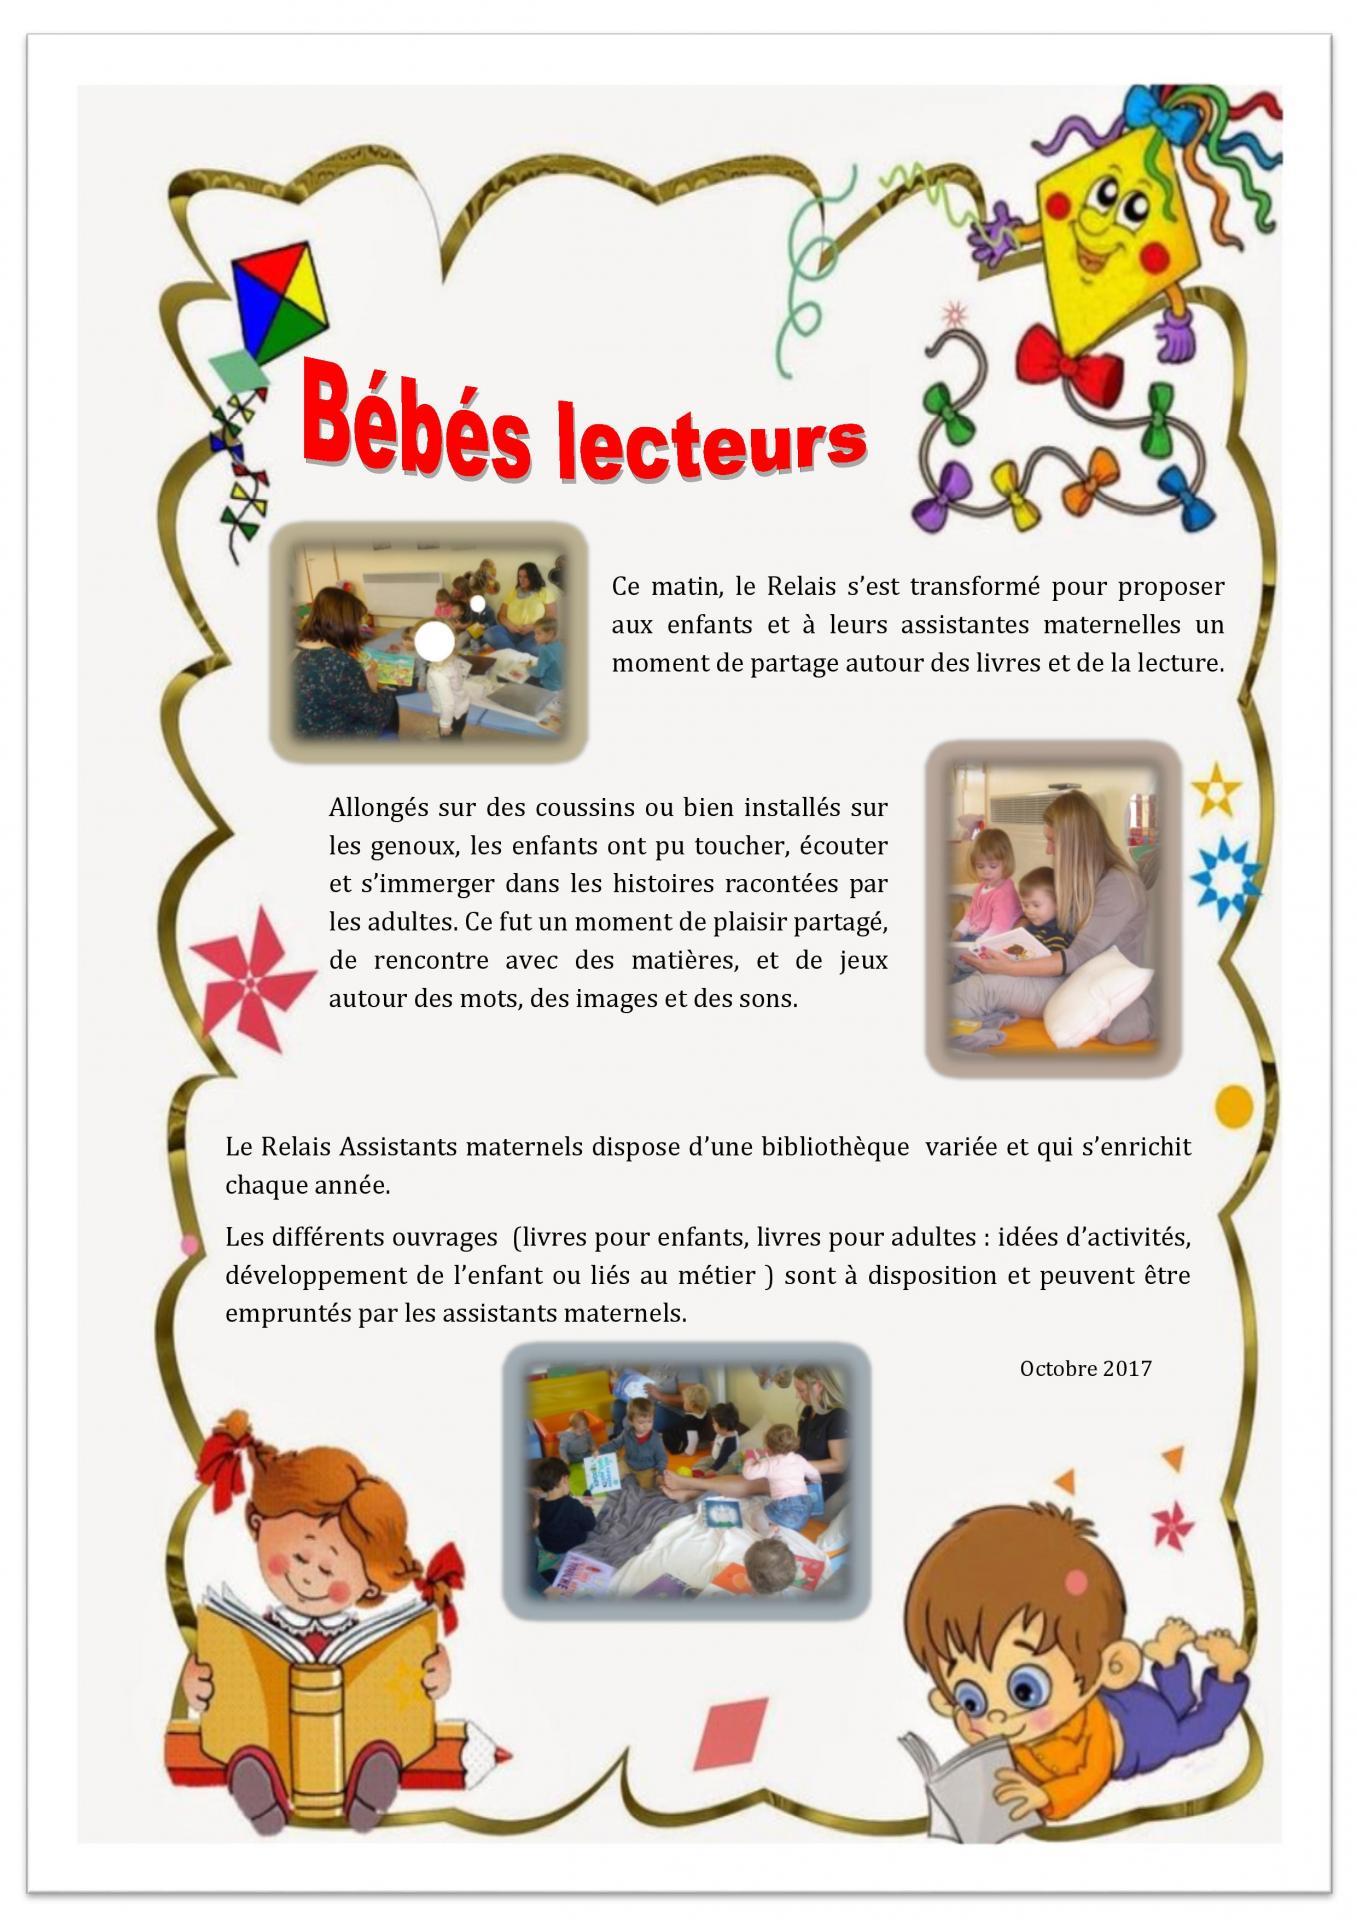 Article ram bebes lecteurs